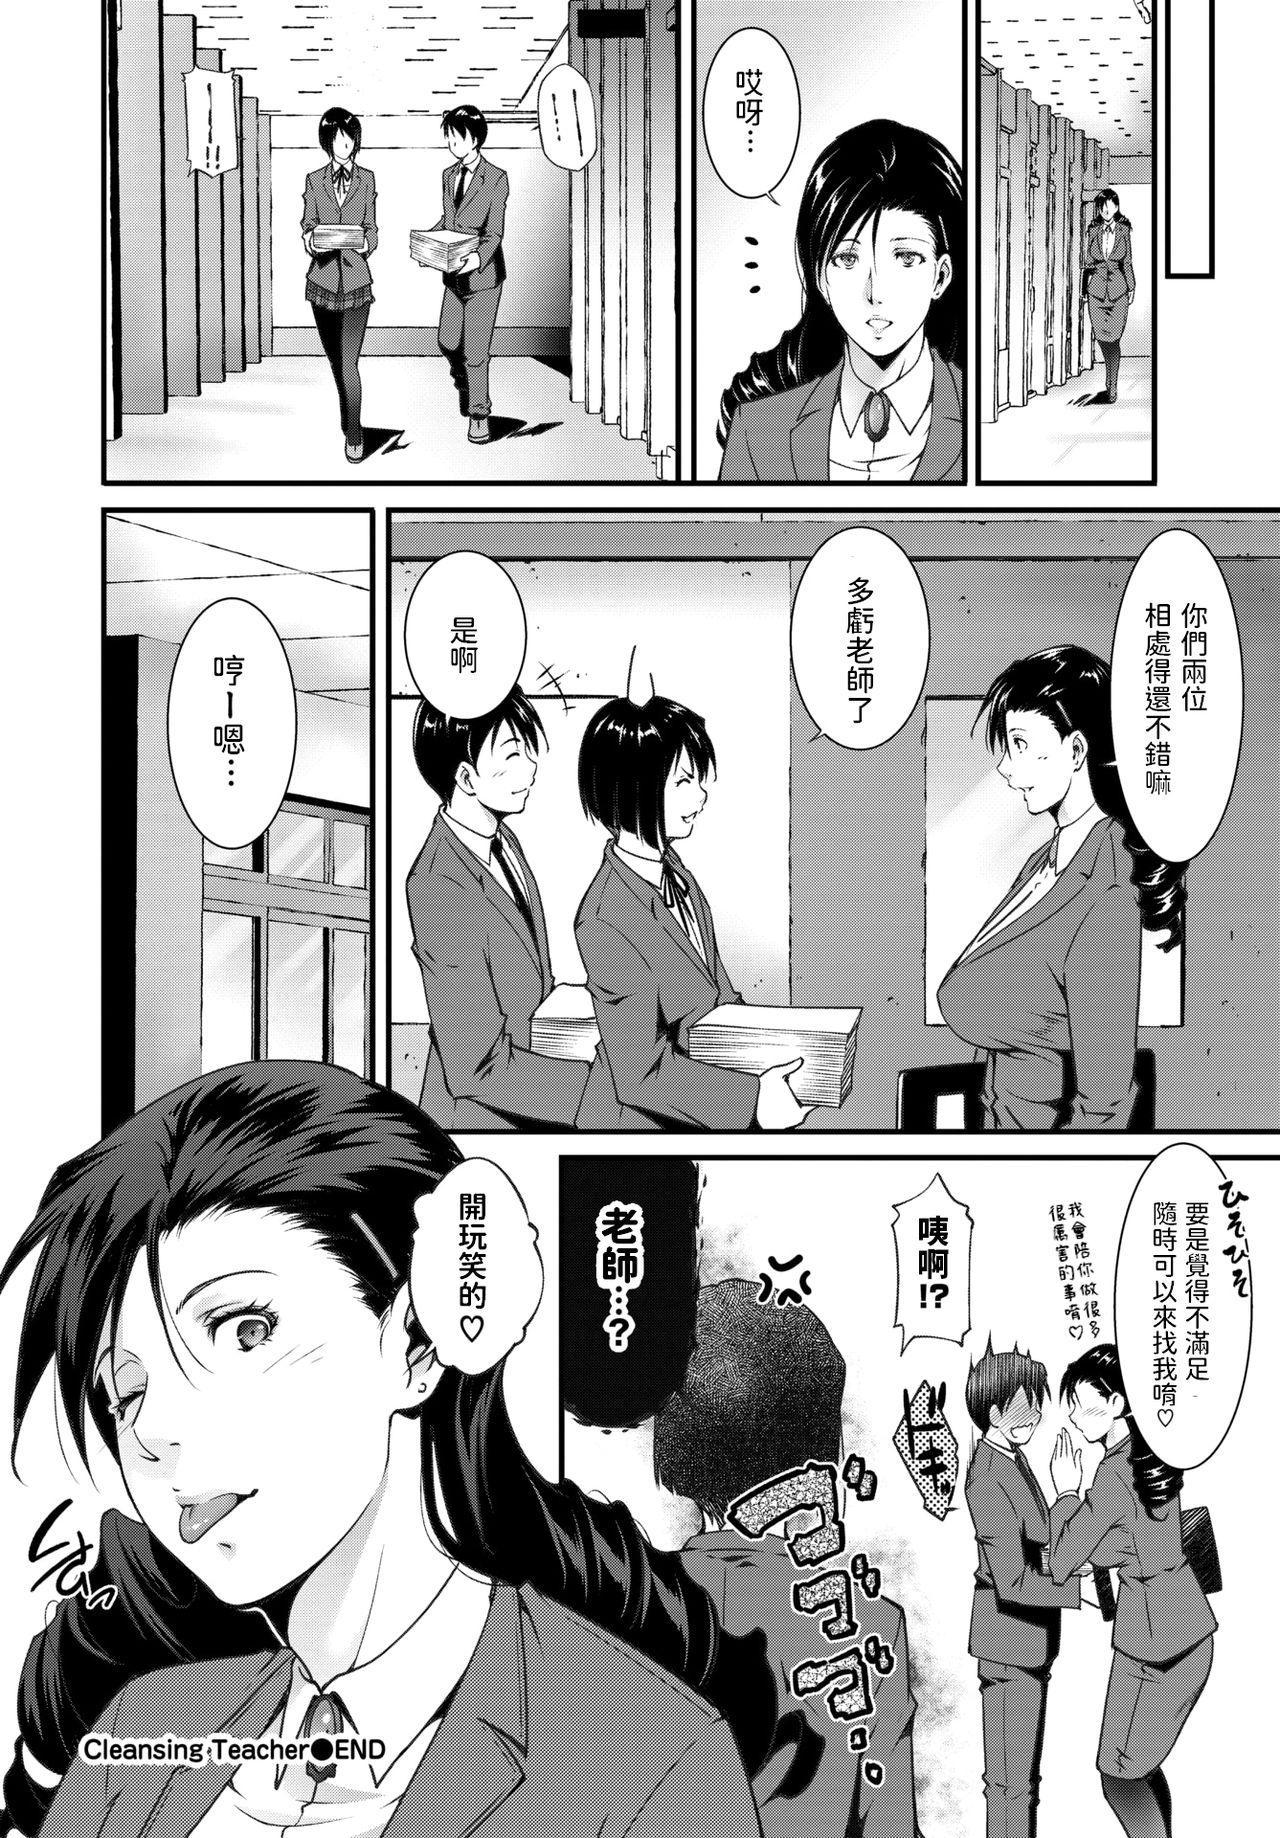 Cleansing Teacher 19